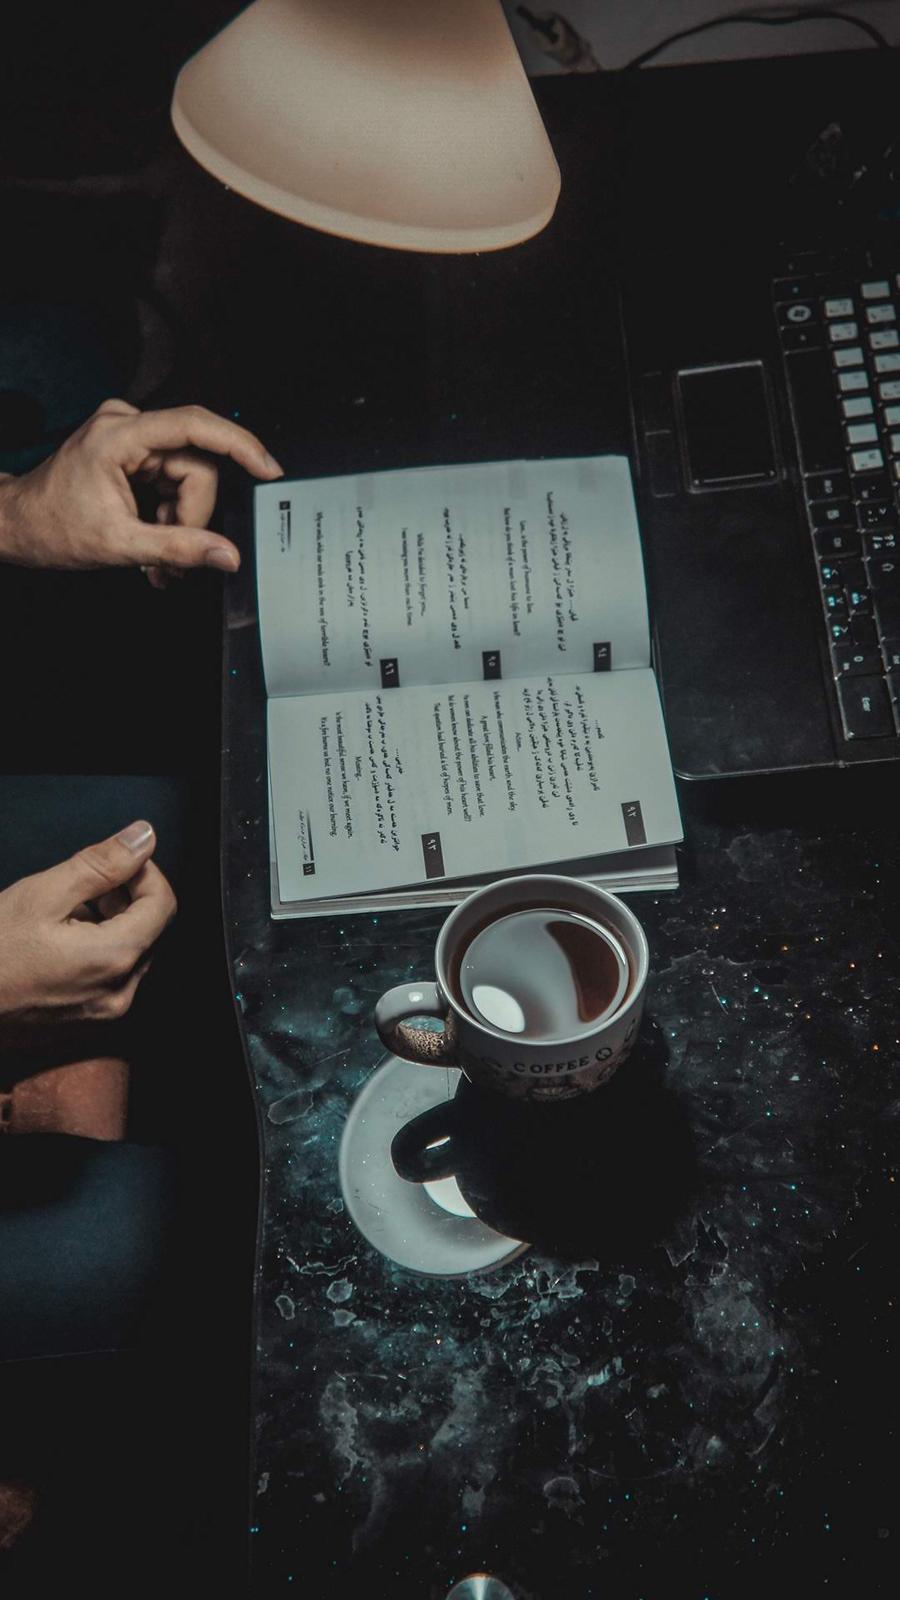 Book & Coffee Wallpaper Download